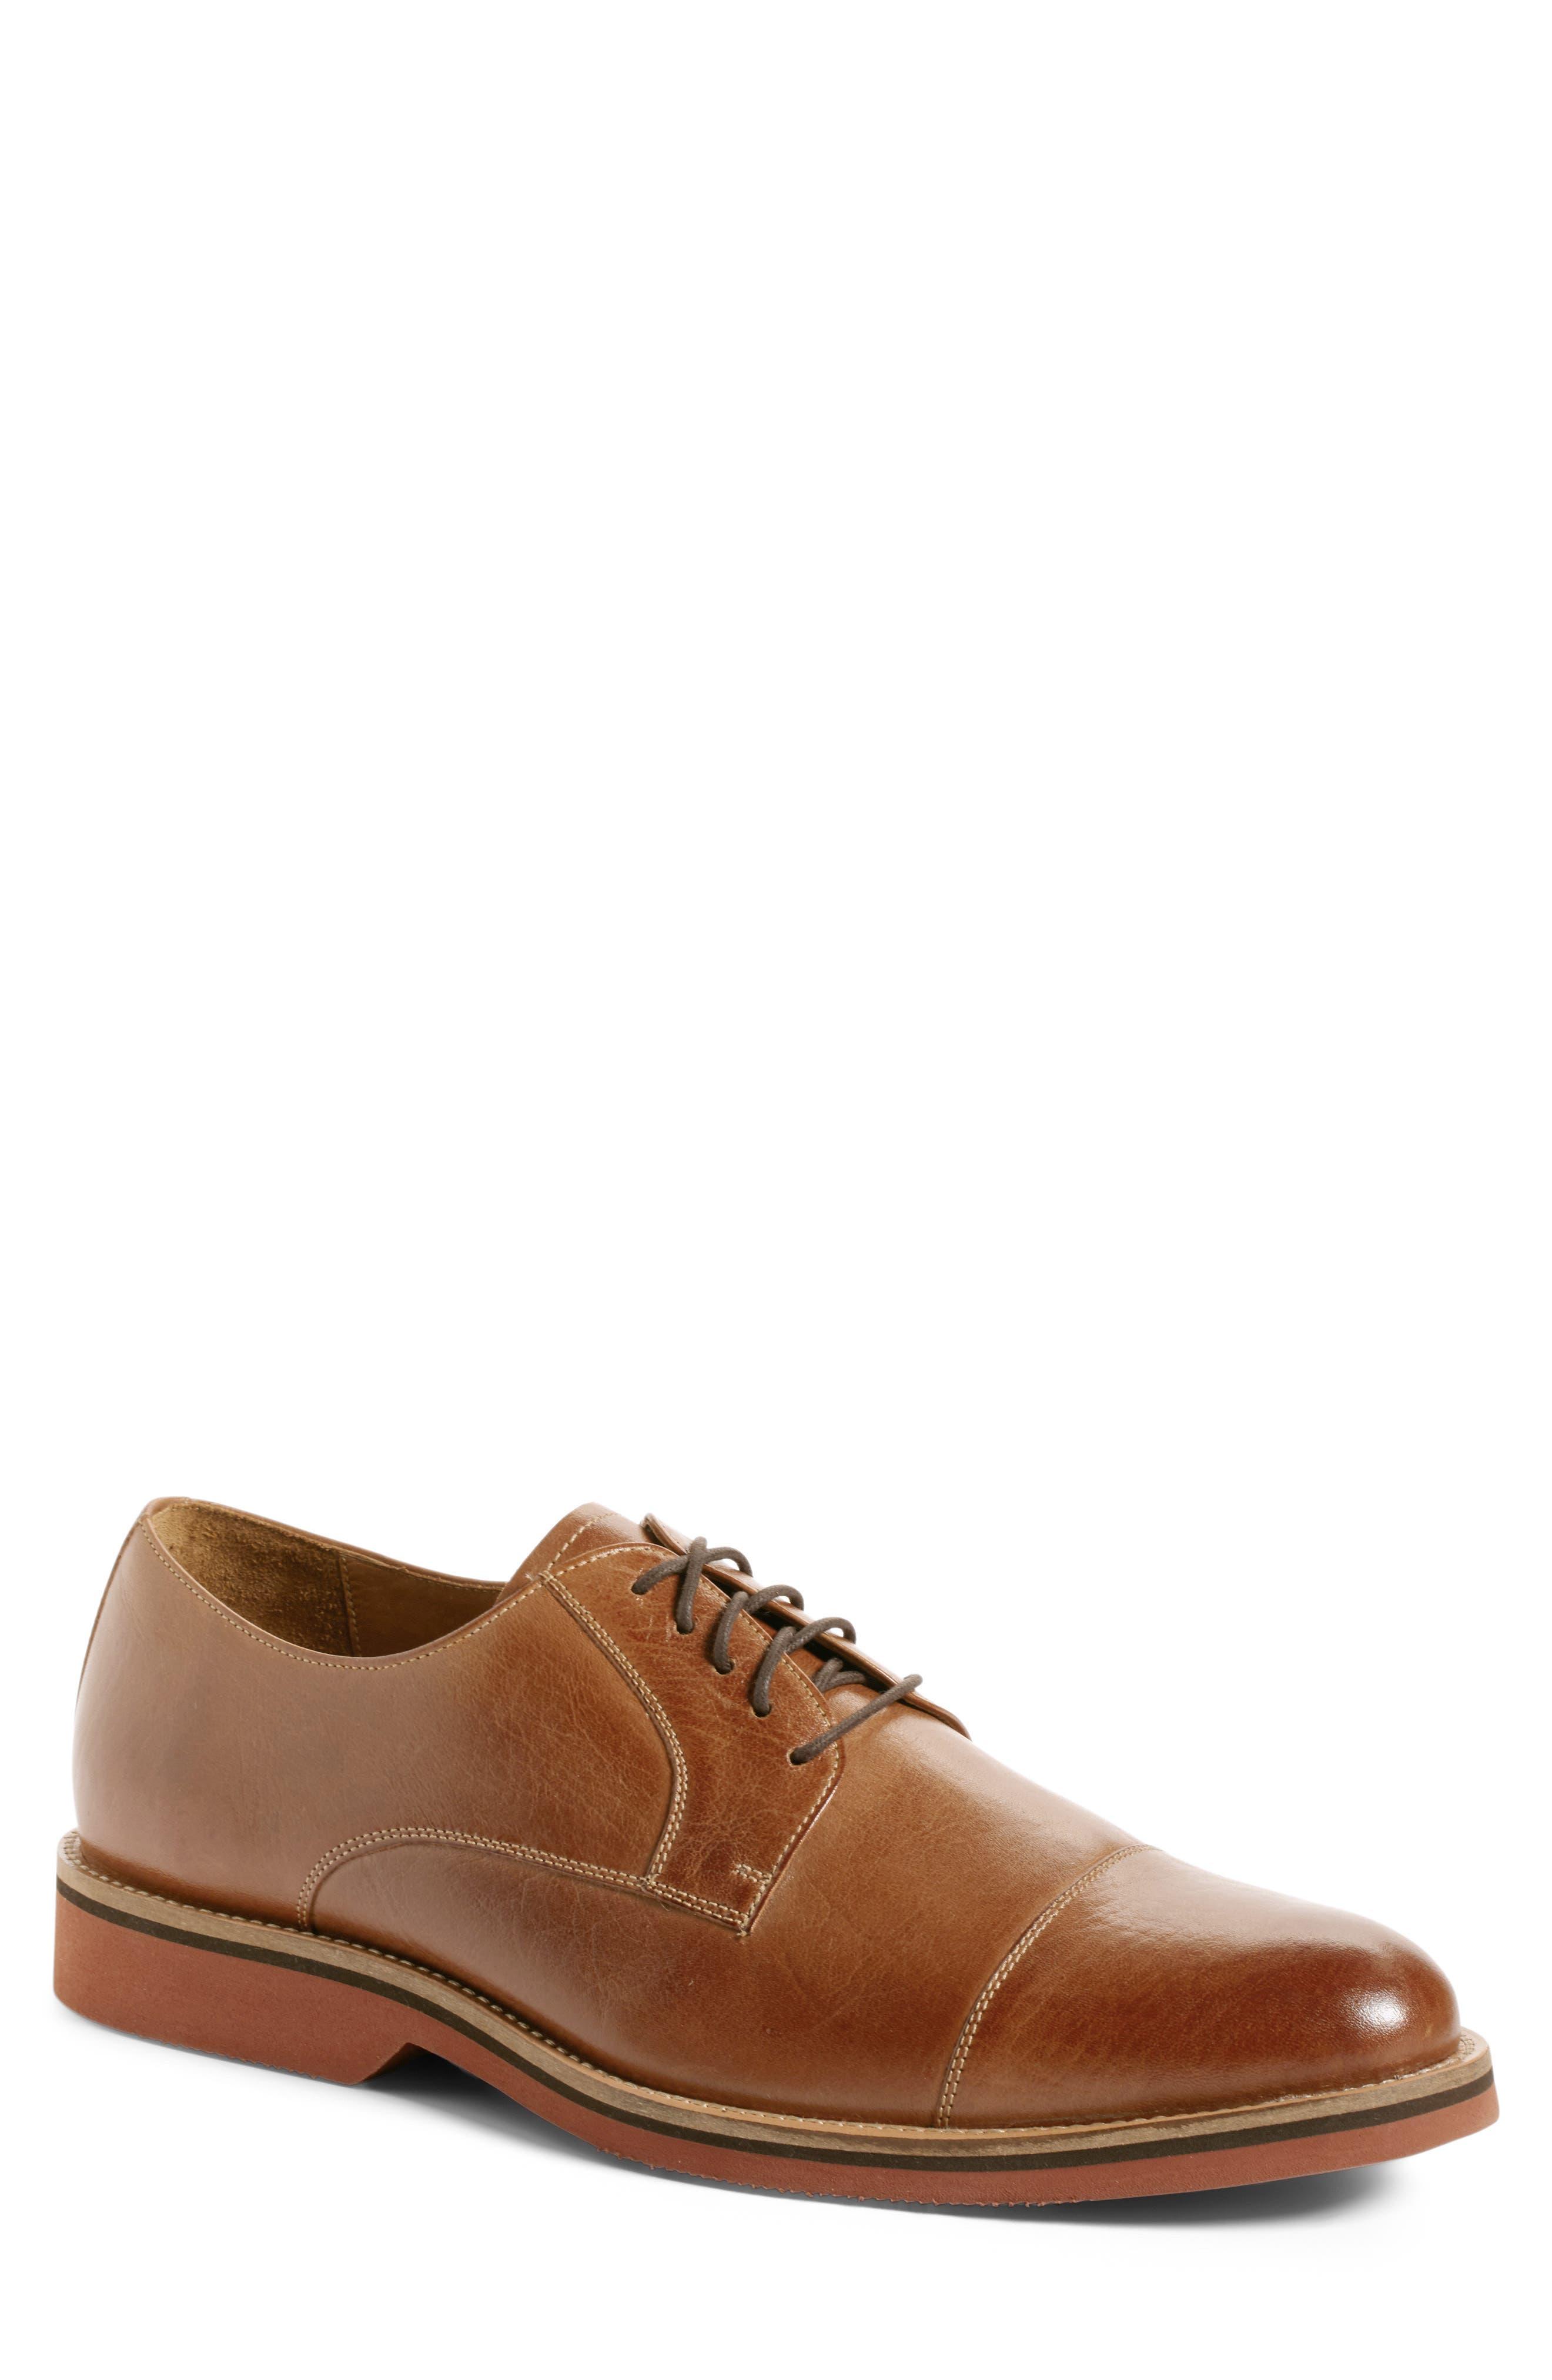 Poulsbo Cap Toe Derby,                             Main thumbnail 1, color,                             Tan Leather